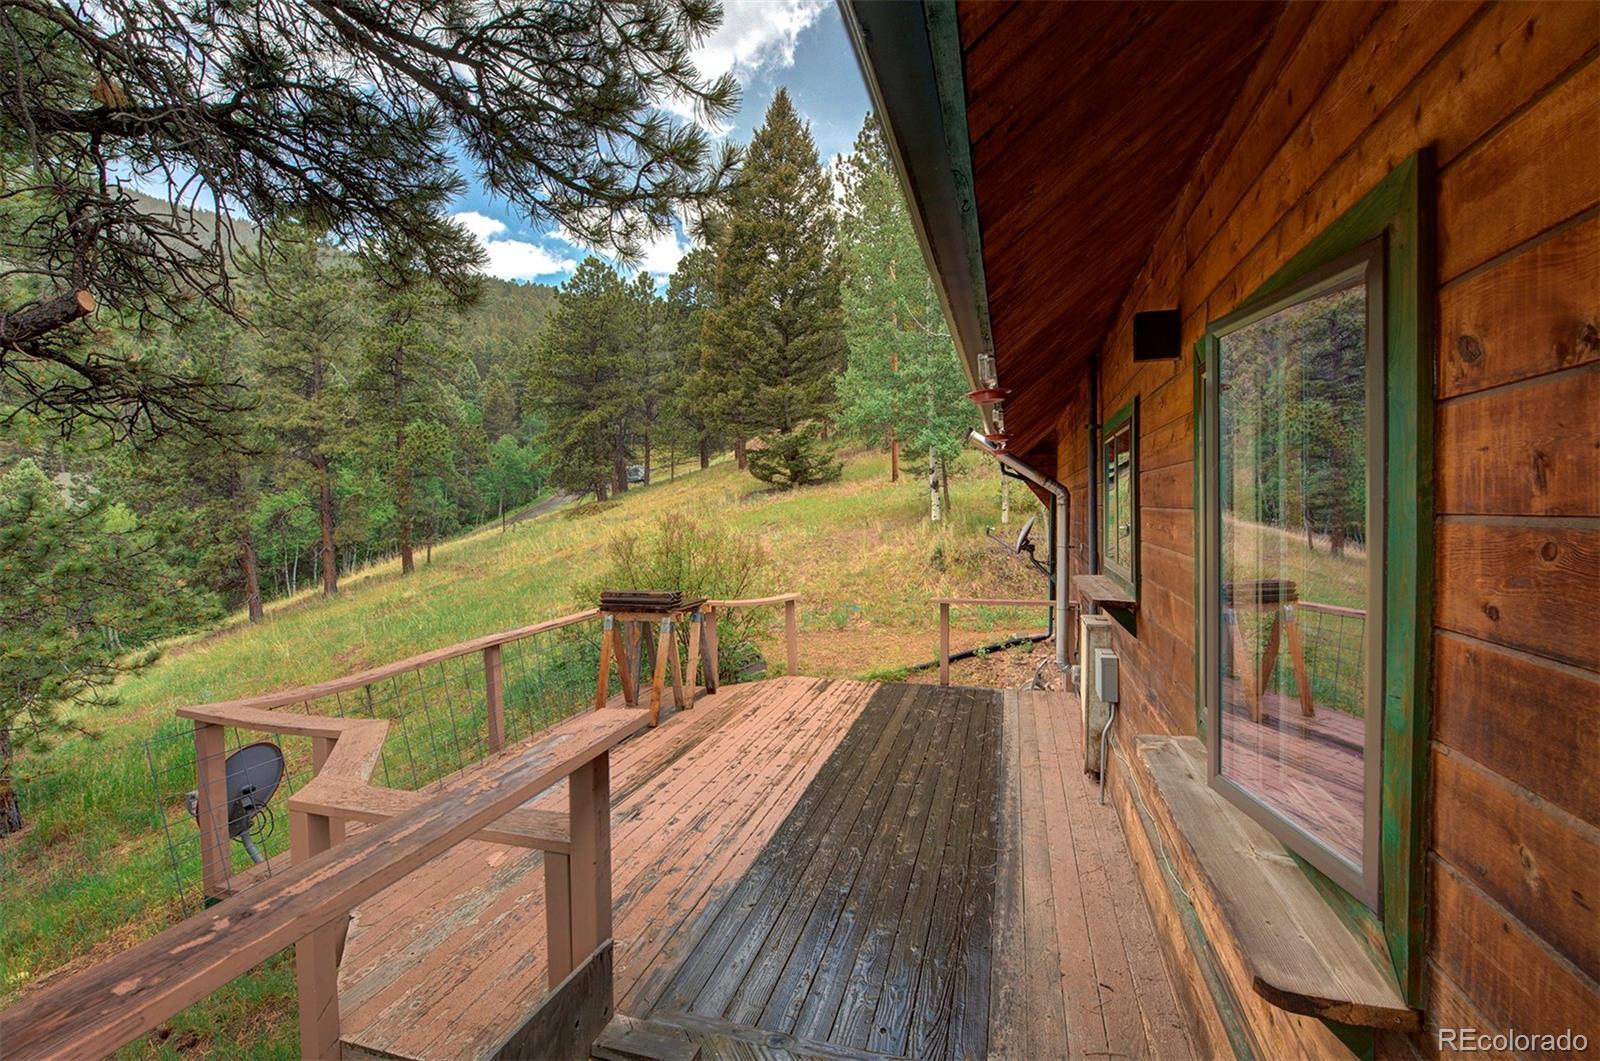 MLS# 6922377 - 36 - 12123 Geronimo Trail, Conifer, CO 80433